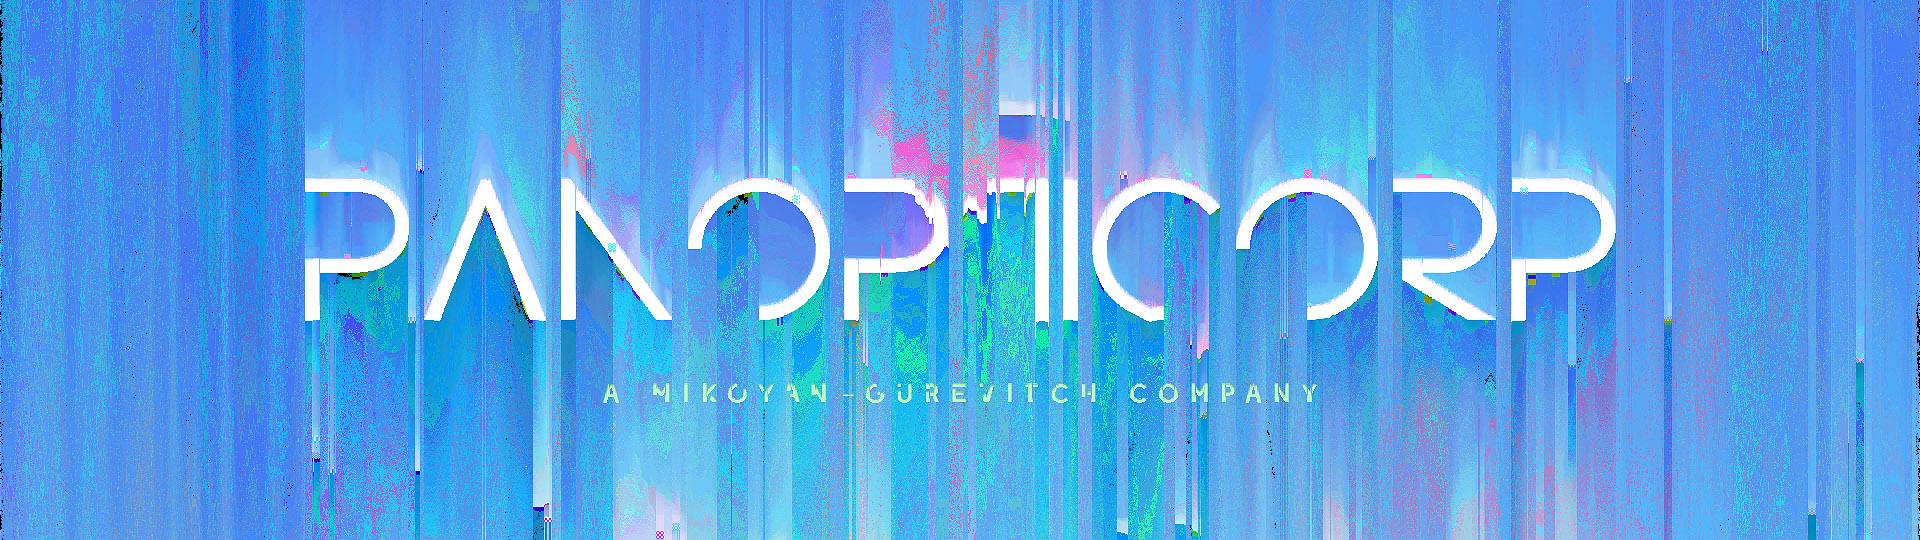 MGLP#001_Panopticorp